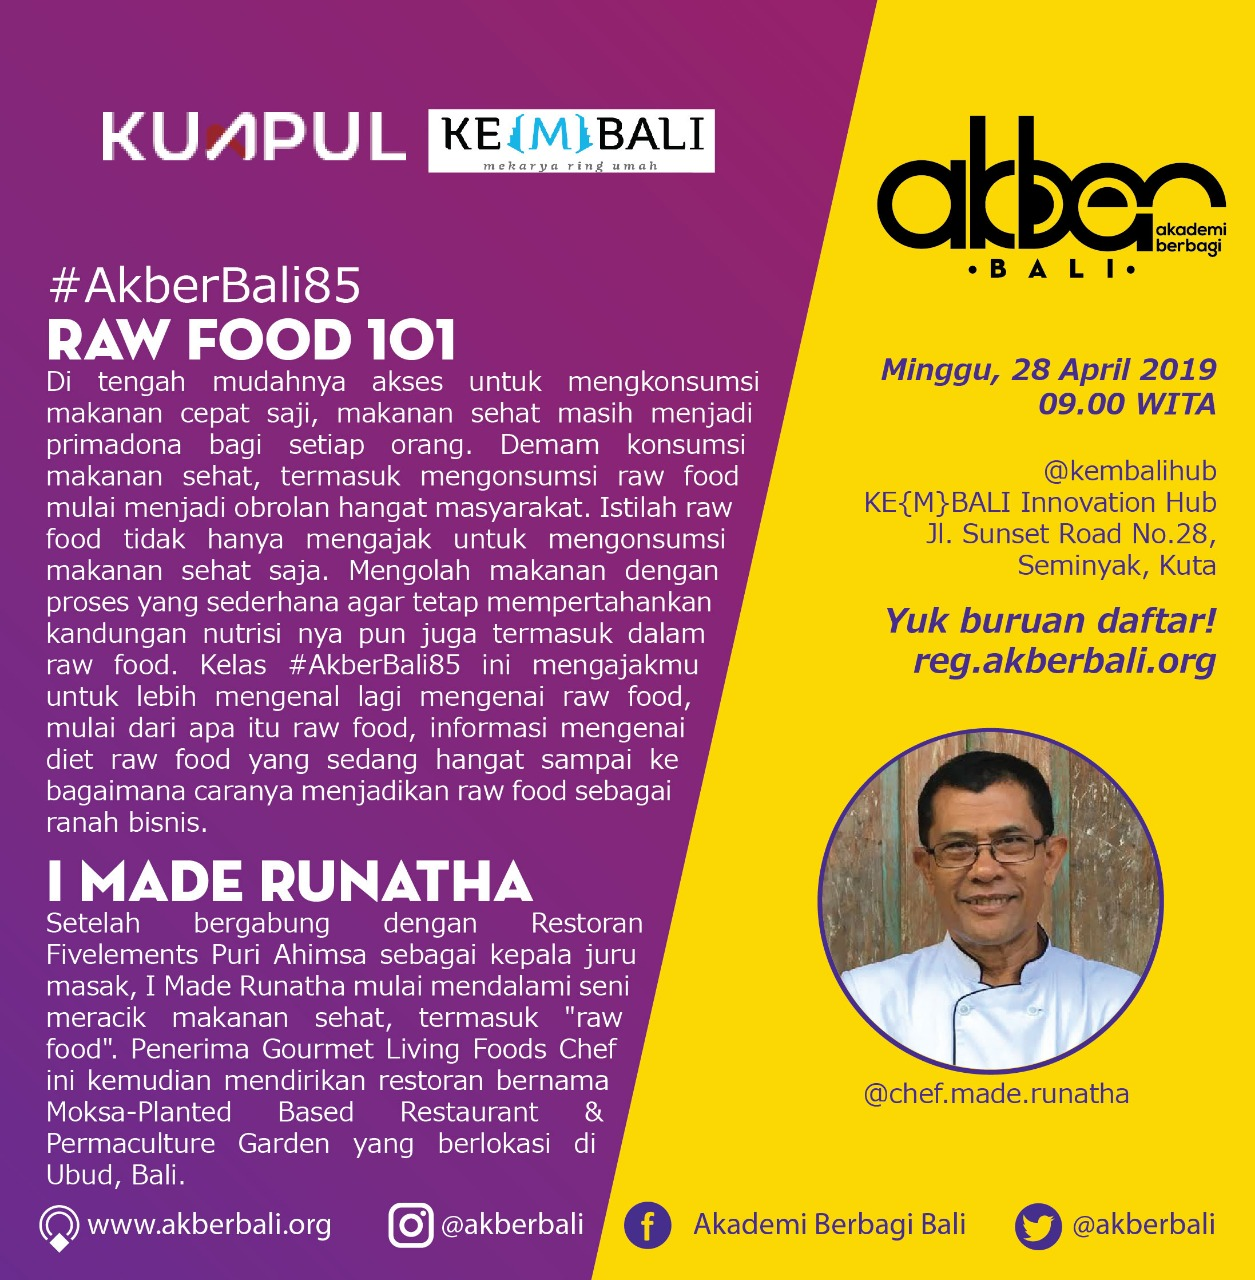 Bali: Raw Food 101